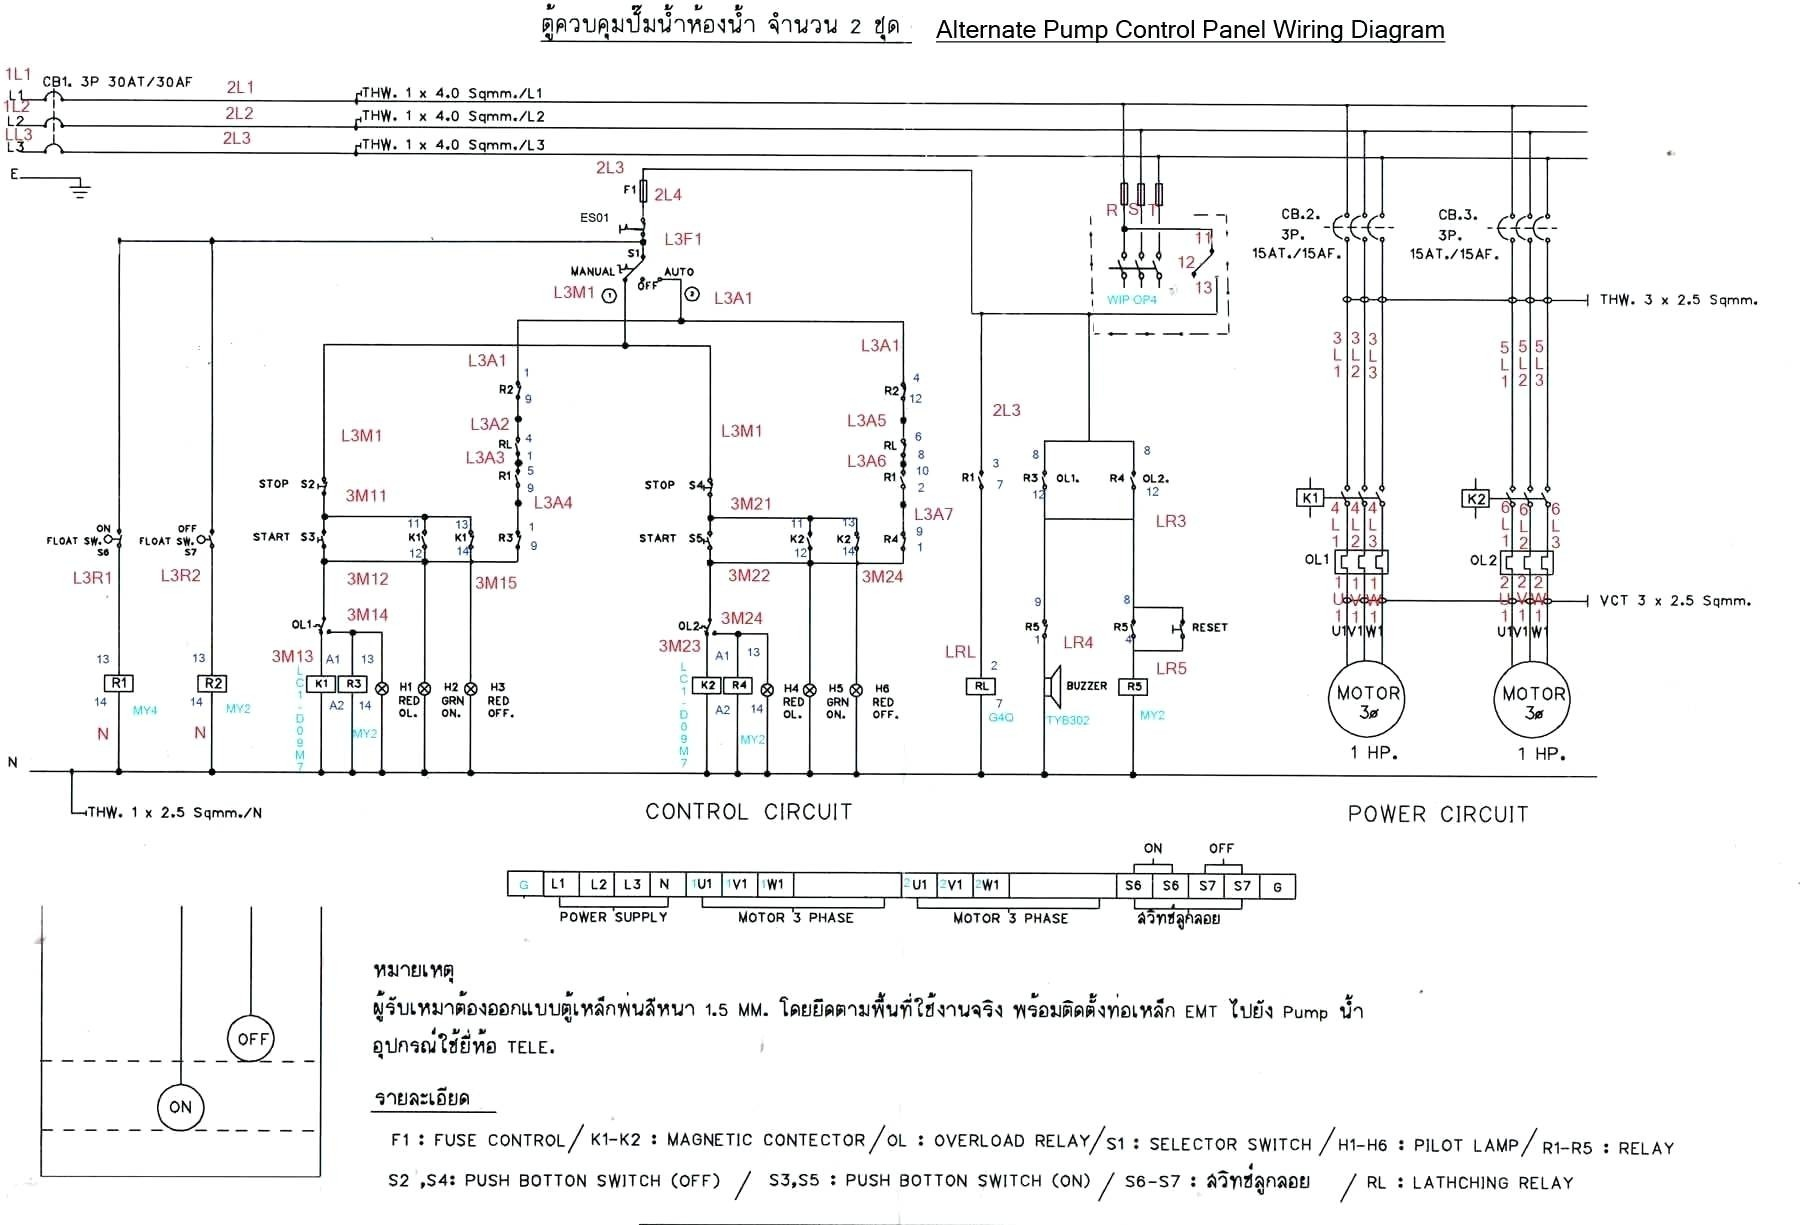 hight resolution of fire pump controller wiring diagram wiring diagram acb schneider new diesel engine fire pump controller